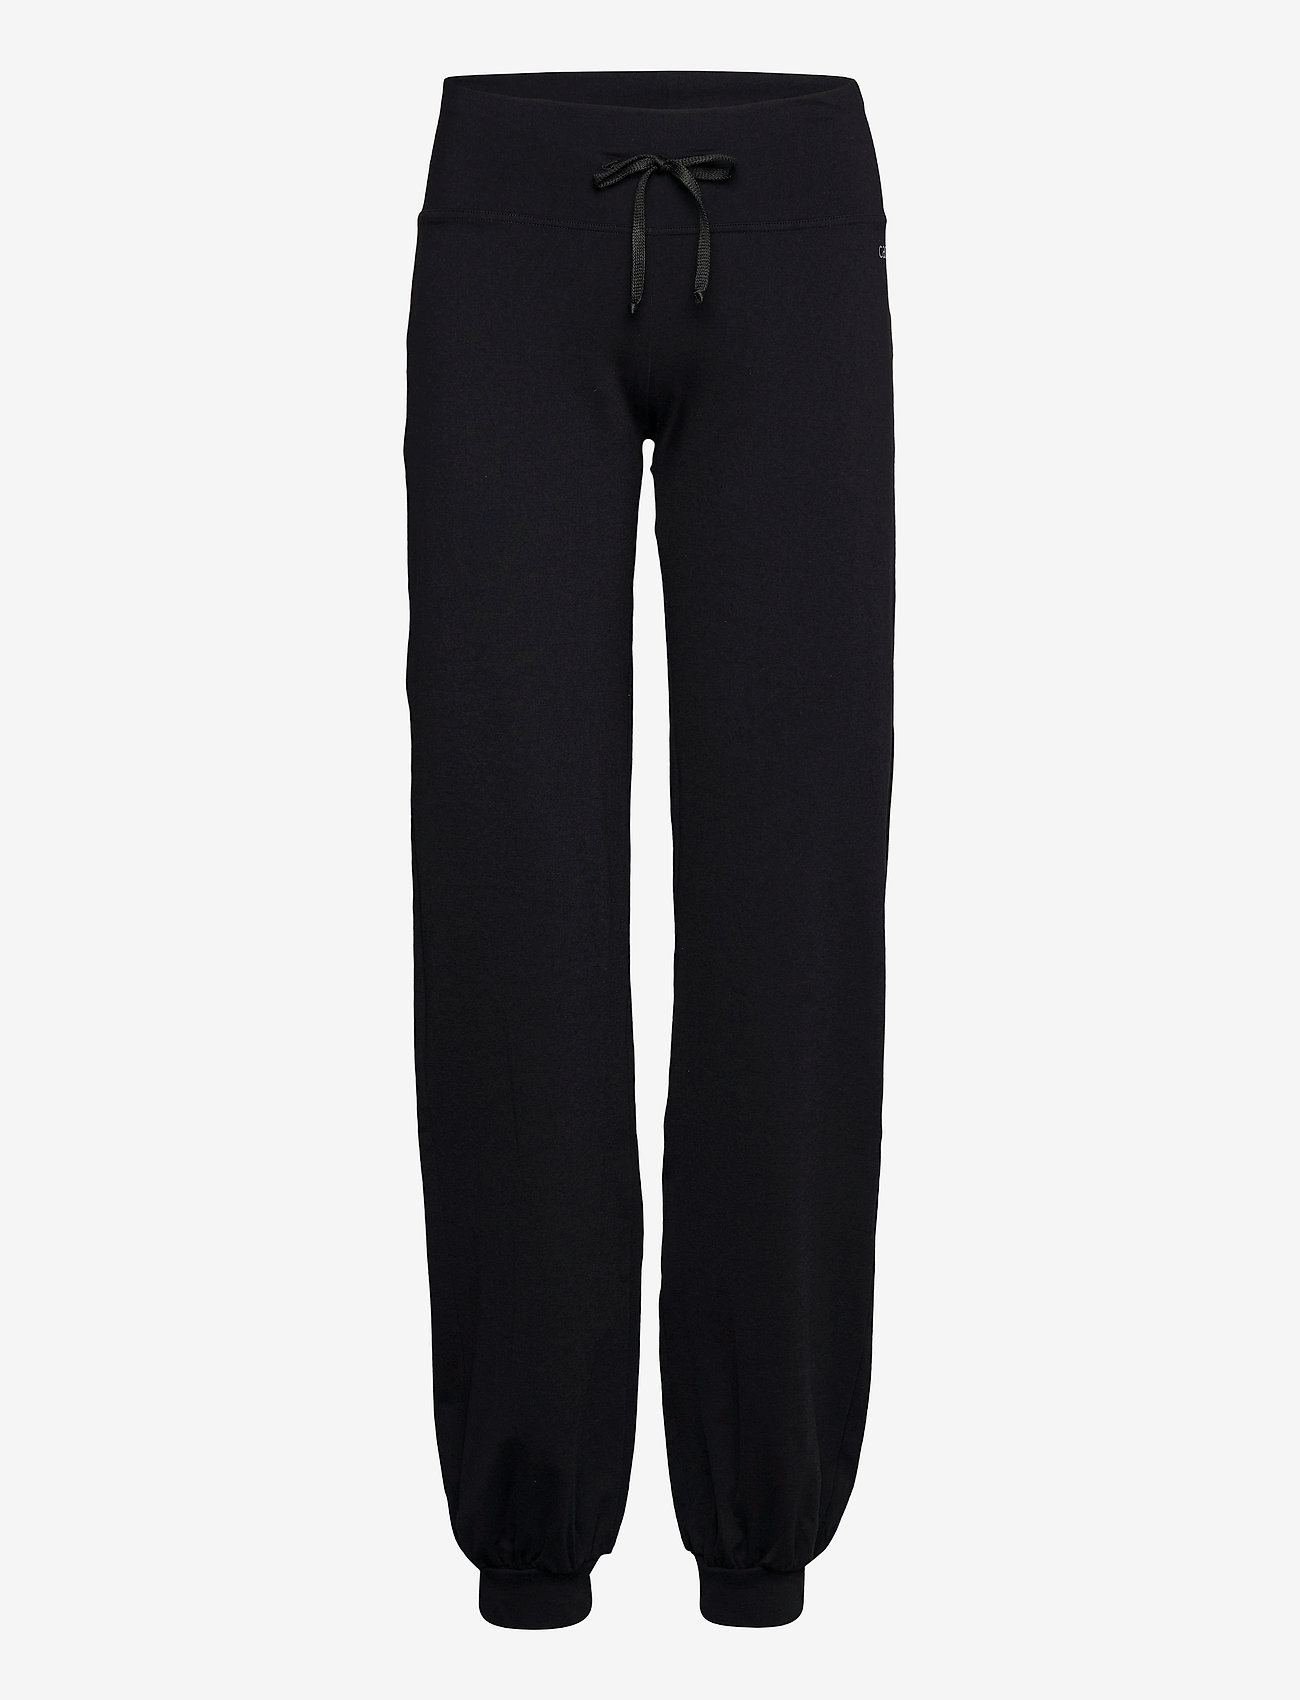 Casall - Plow pants - spodnie treningowe - black - 0